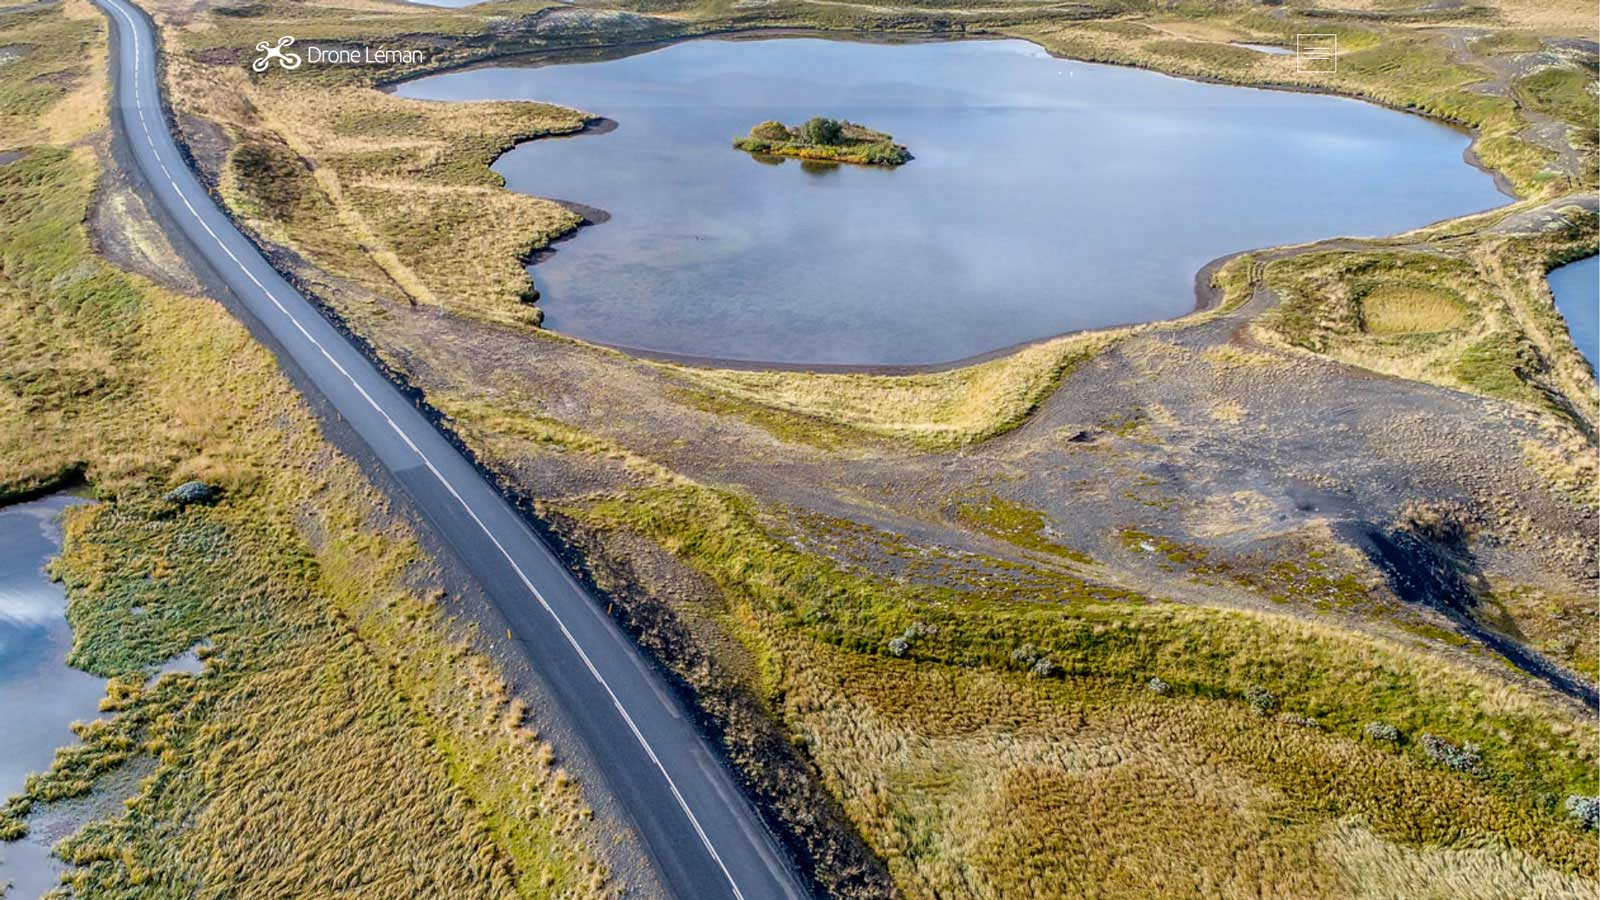 Création web, webdesign, wordpress : site droneleman.com - Islande vue du ciel